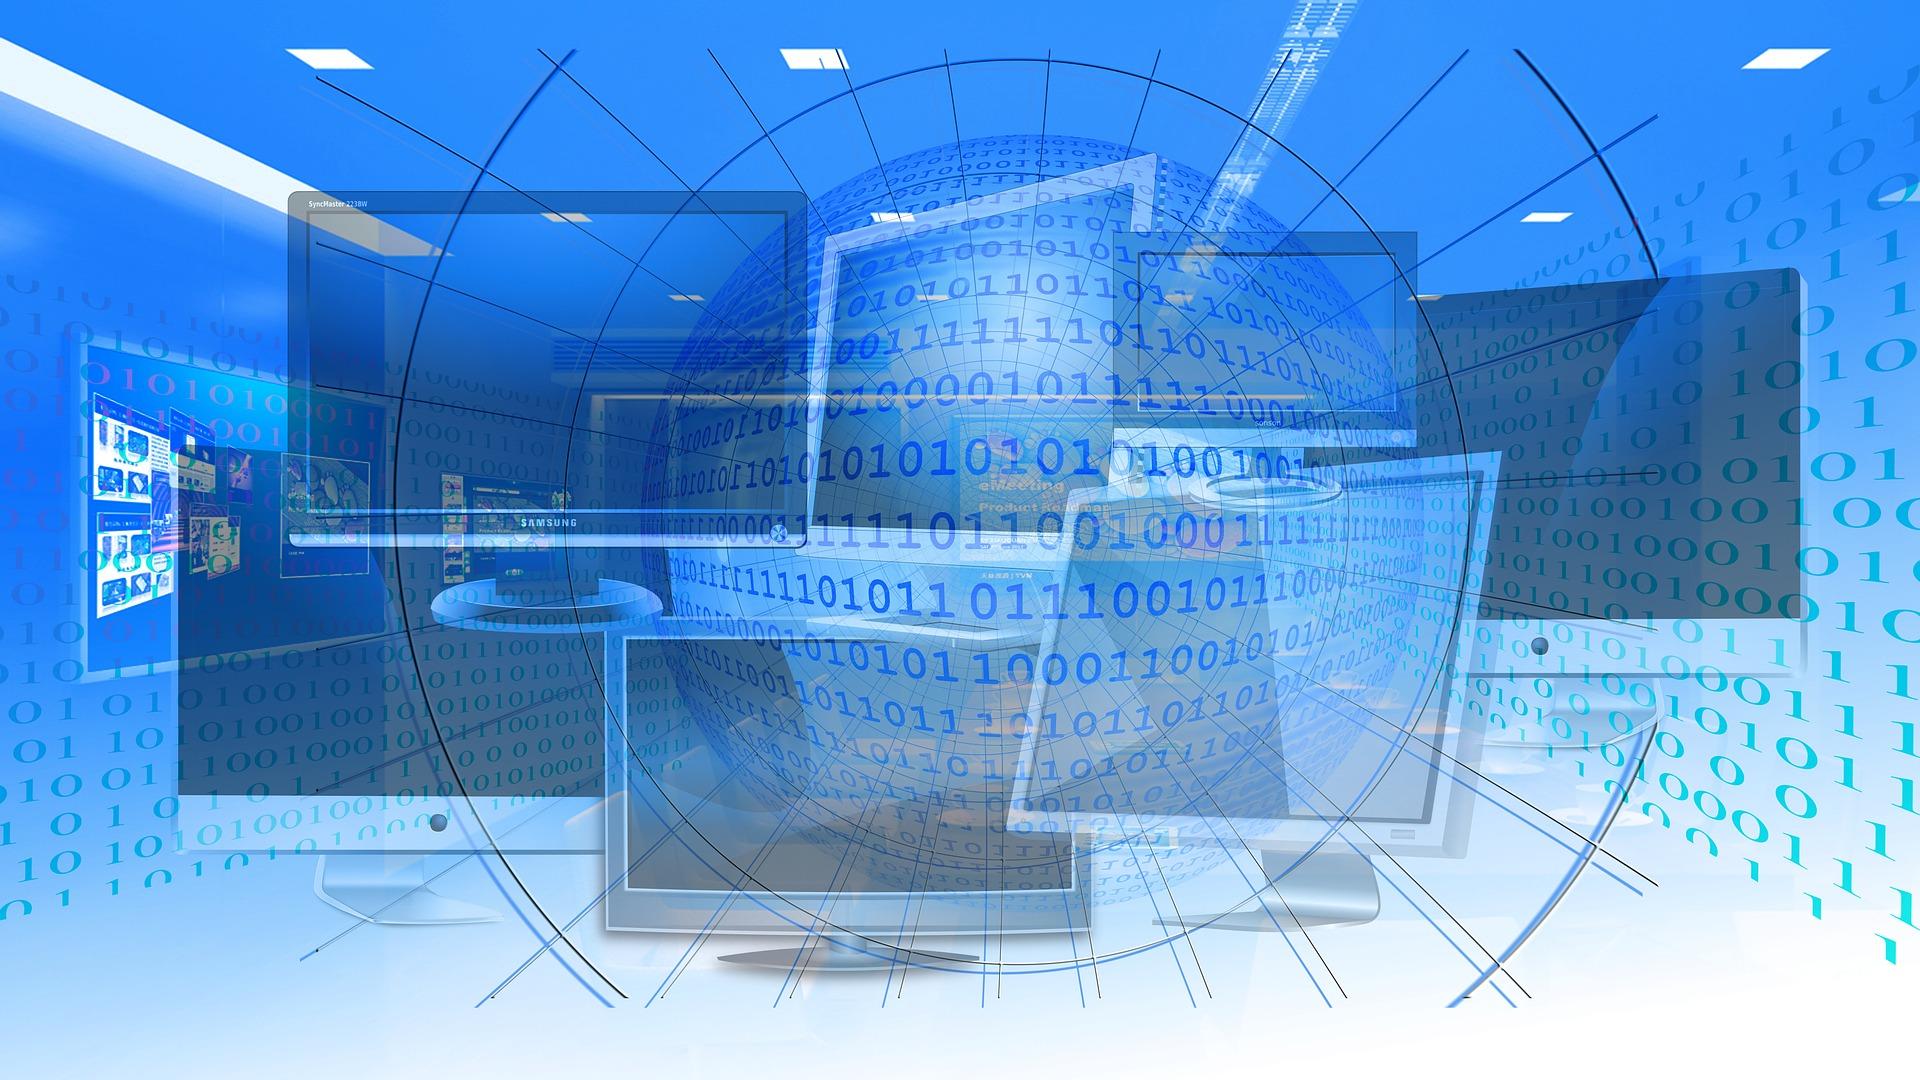 Zabbix e monitoramento proativo de redes: entenda a importância deles